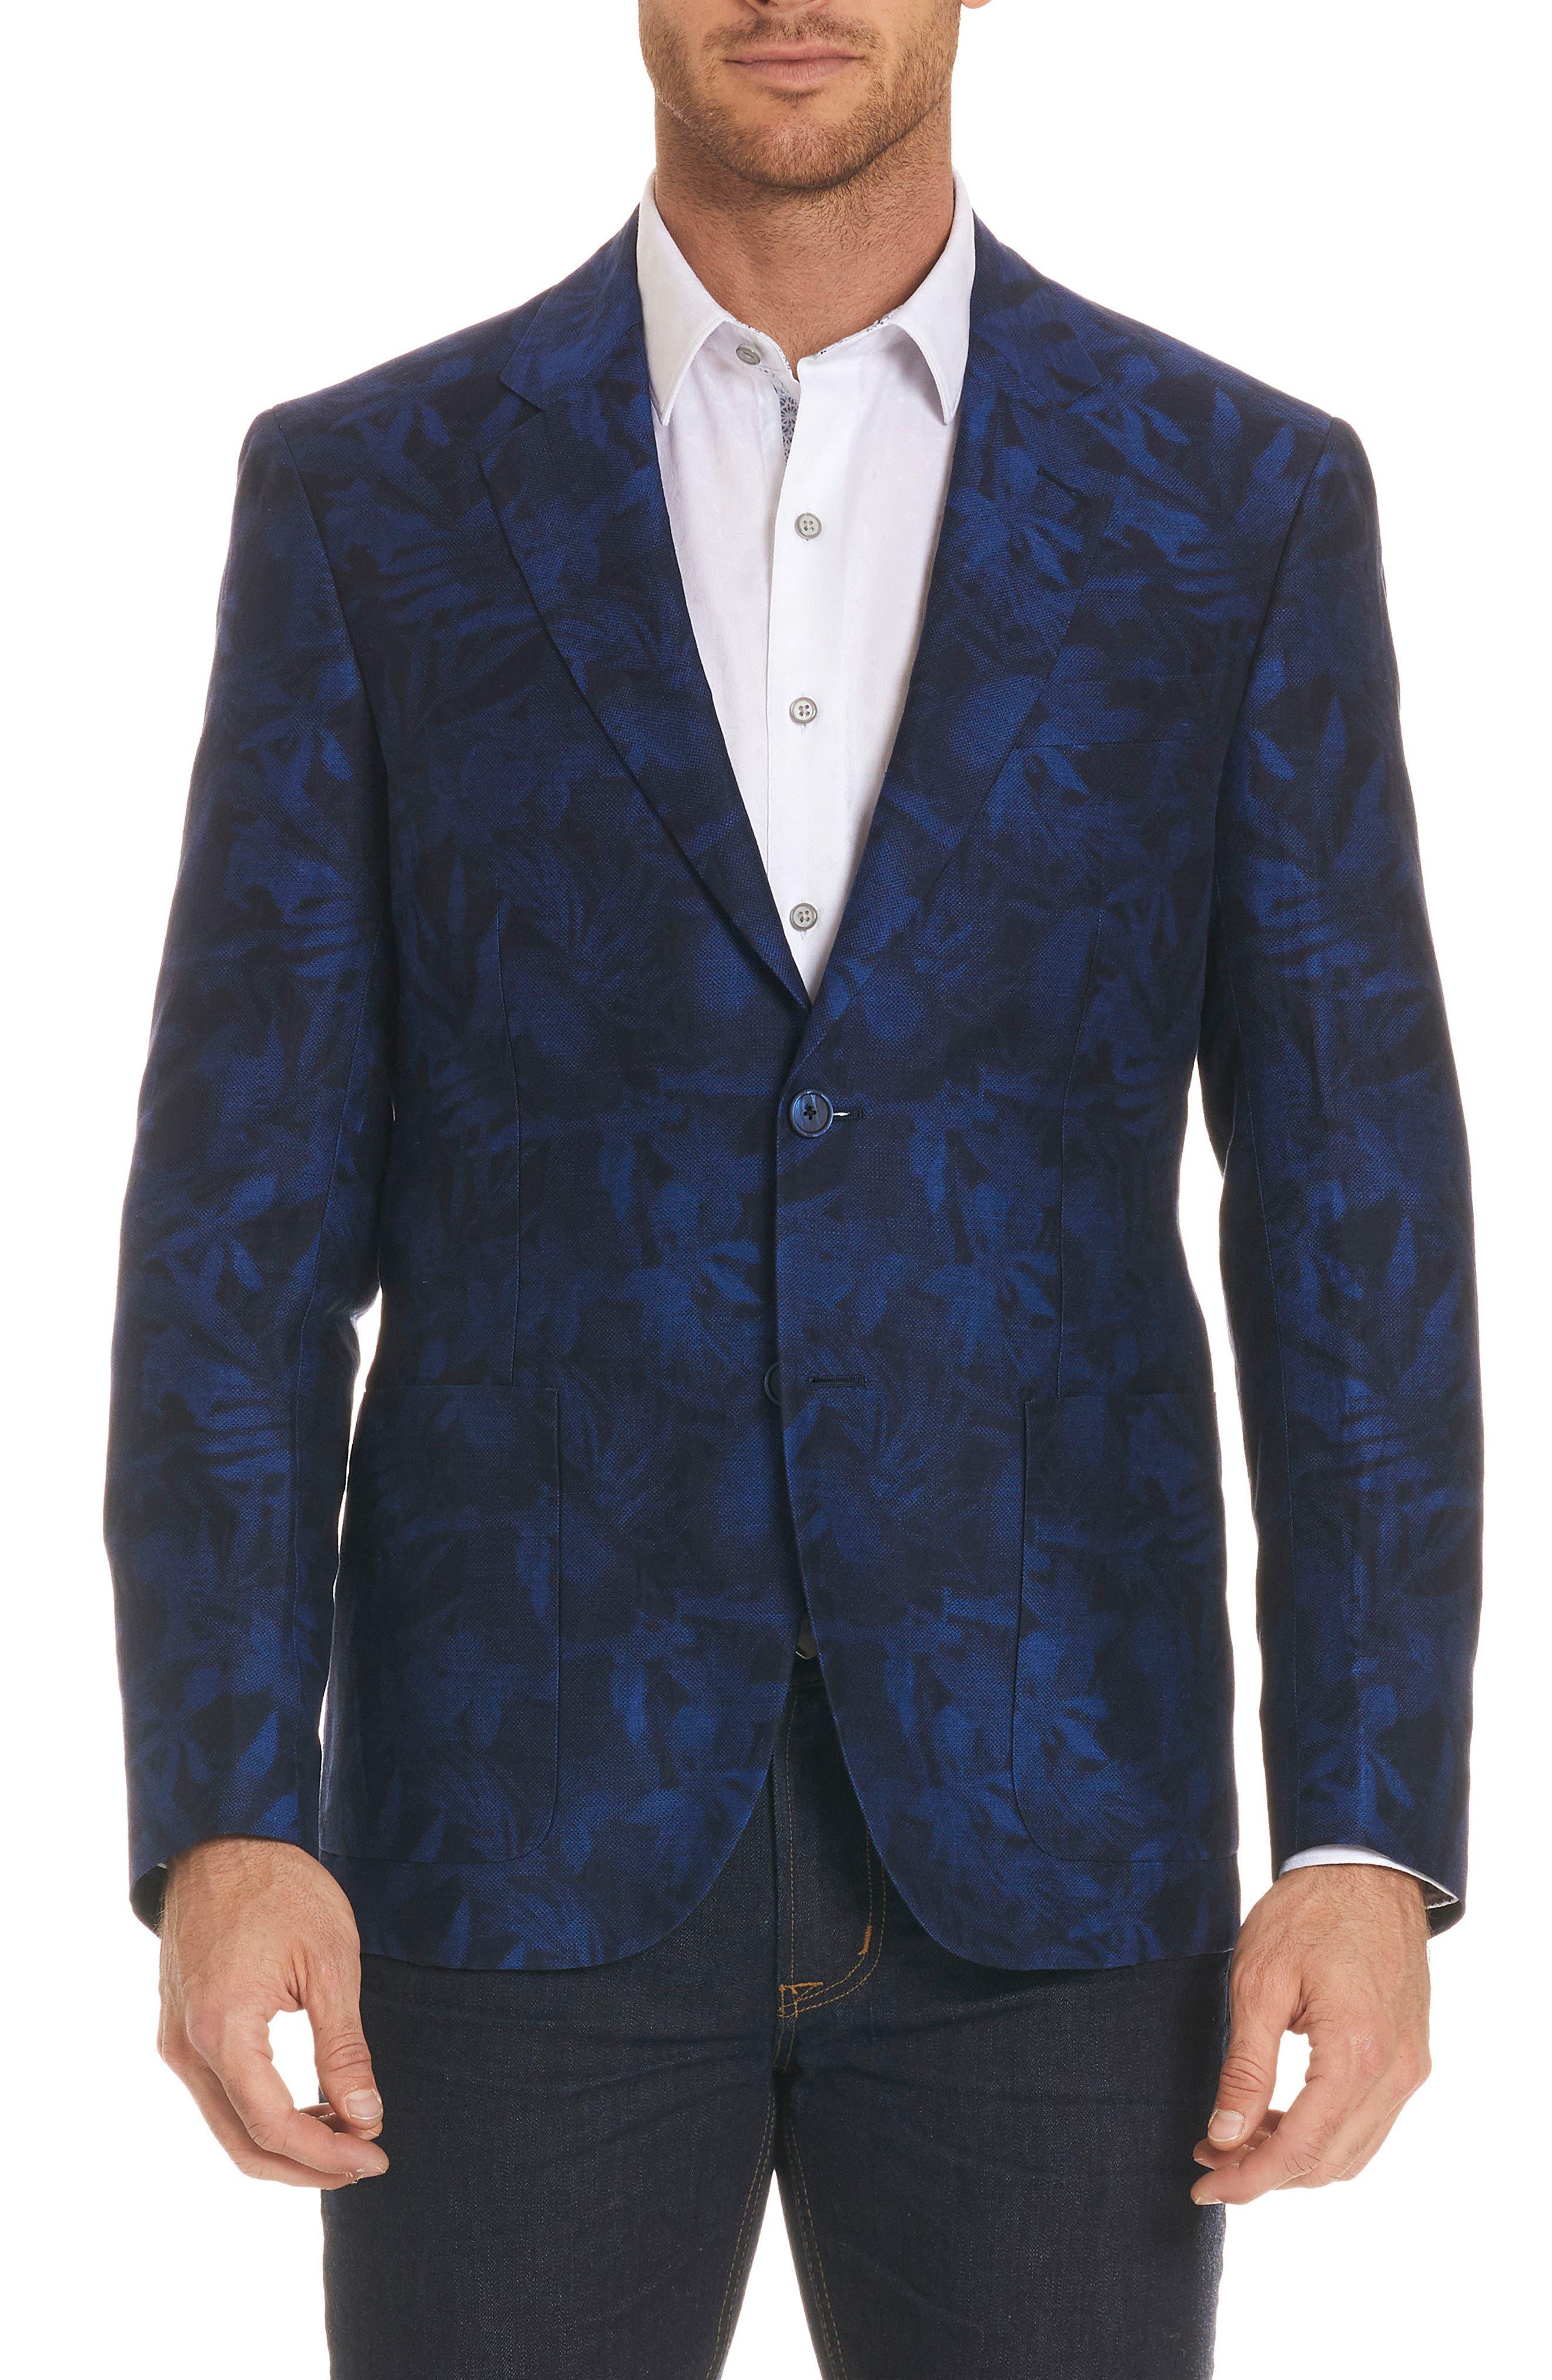 Alternate Image 1 Selected - Robert Graham Buxons Linen & Cotton Sport Coat